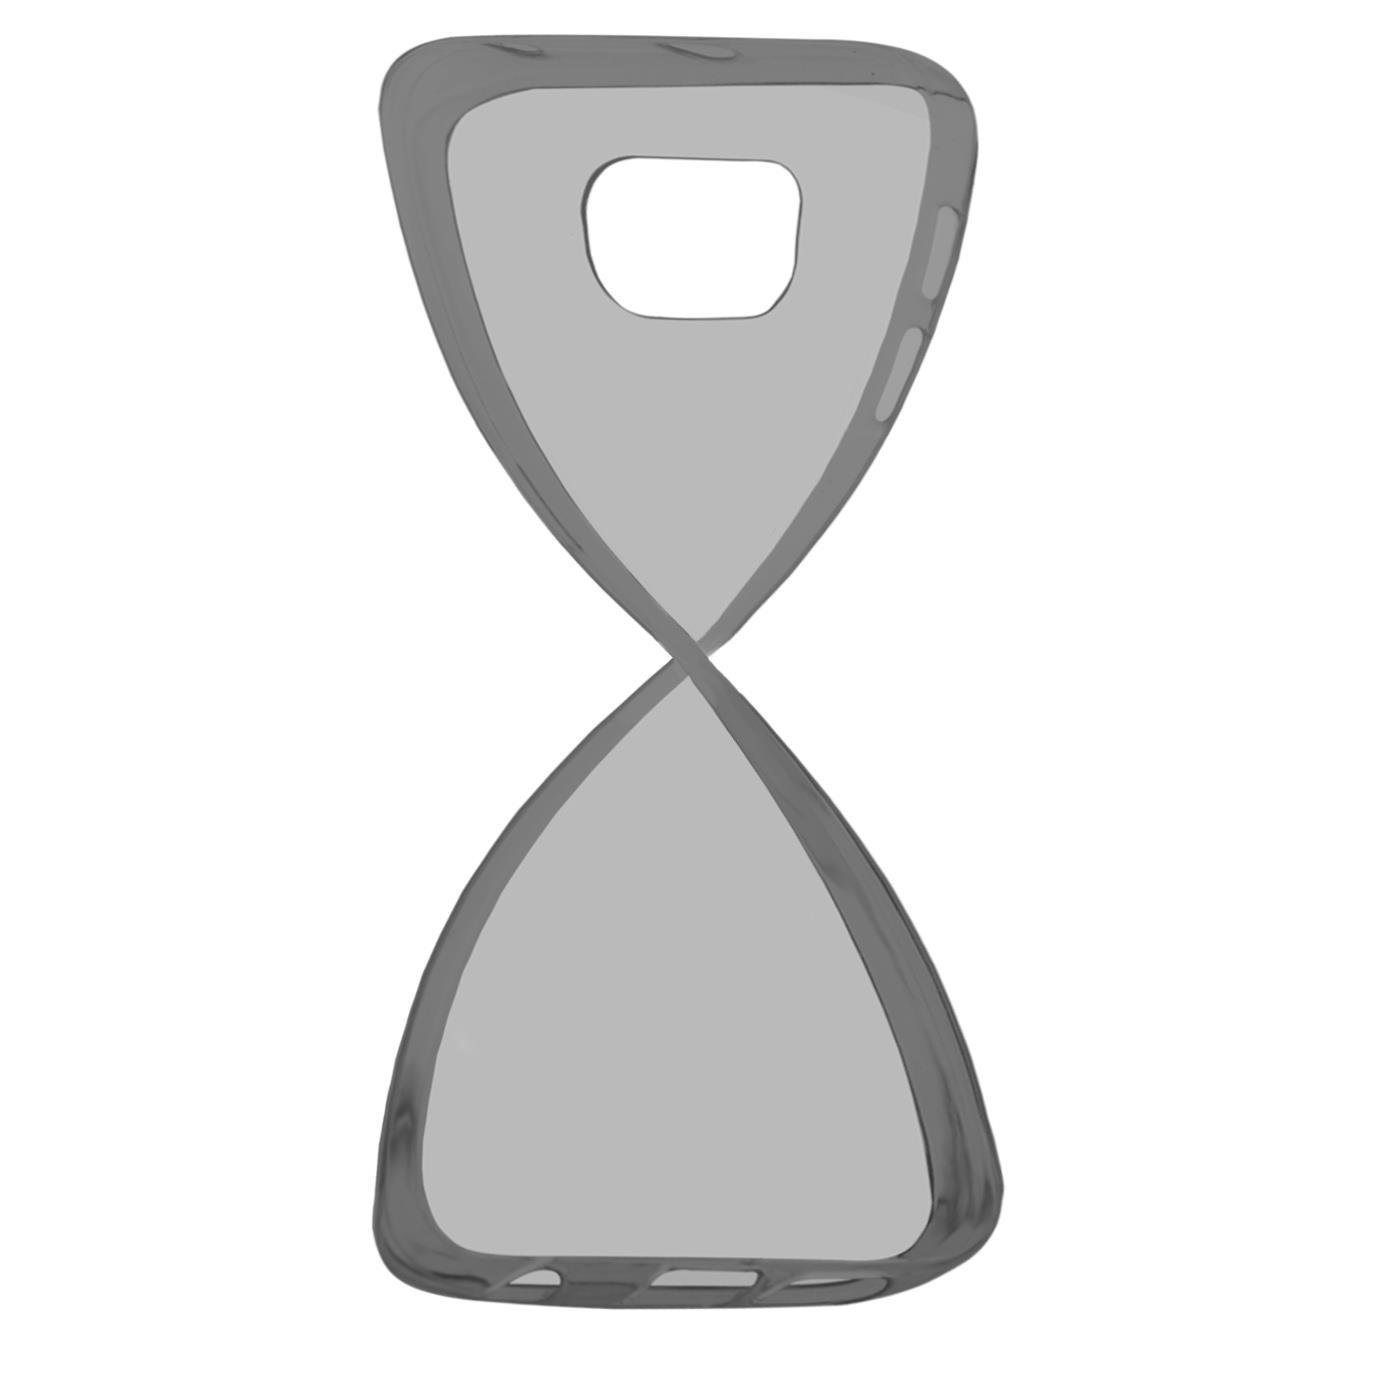 Samsung-Galaxy-s6-Edge-Plus-Thin-Silikon-Klar-Case-Cover-Ultra-Slim-Stossfeste Indexbild 30